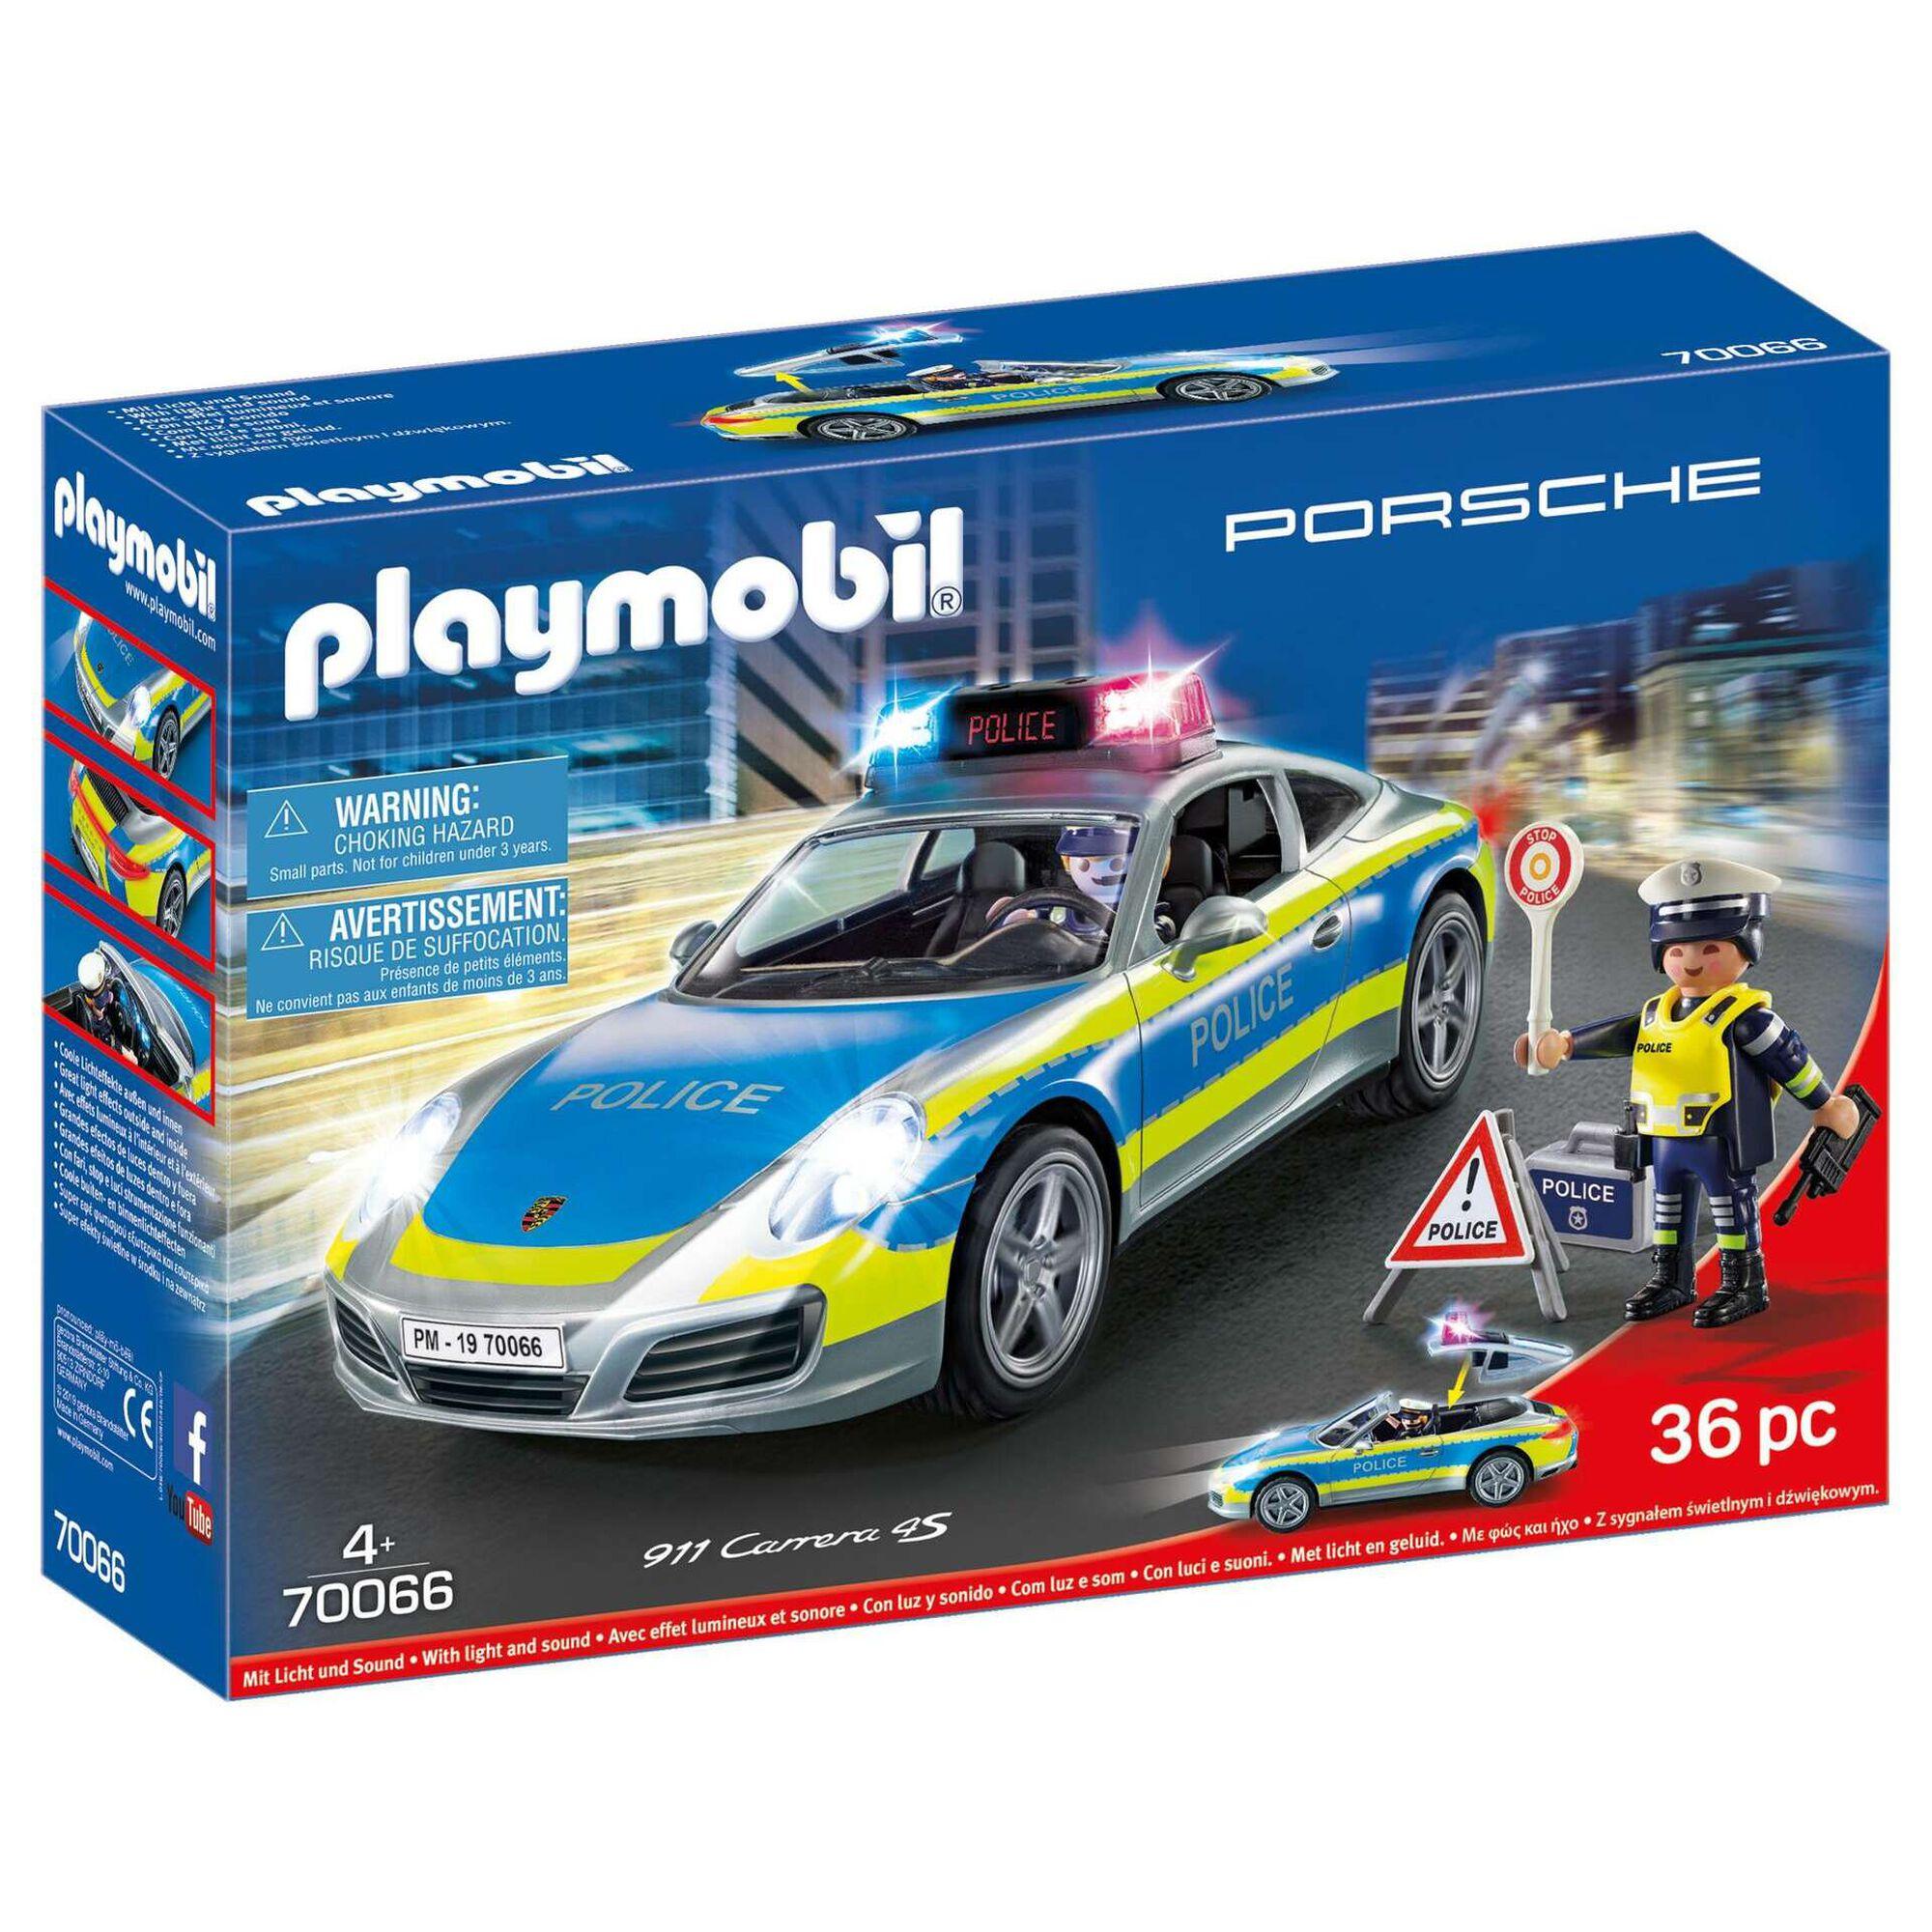 Porsche 911 Carrera 4S da Polícia - 70066